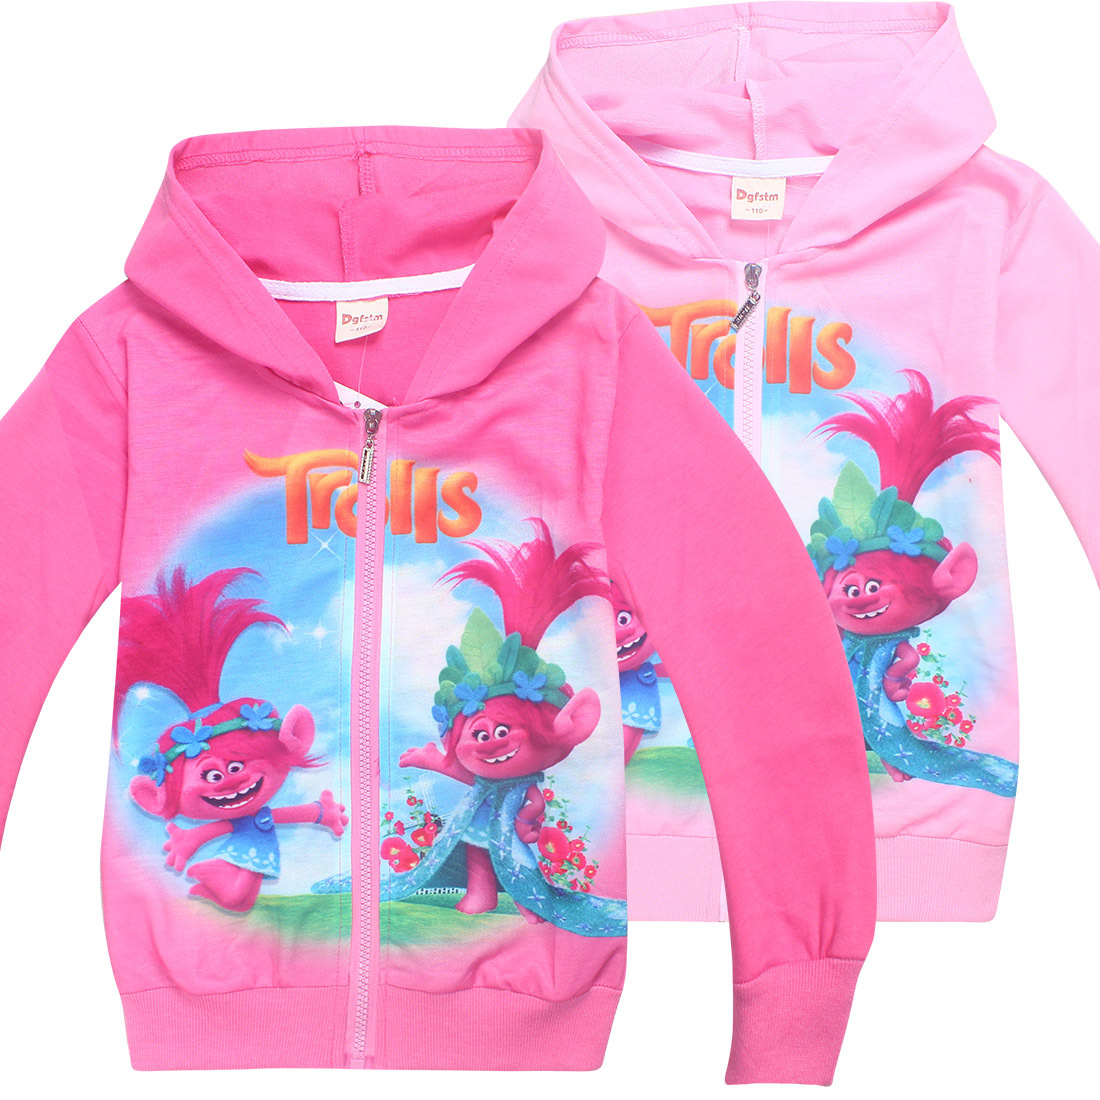 Trolls Baby Girls Cardigan Children Sweater Hoodies Girls Zipper Coat Children Clothes Trolls Costumes Cartoon Kids Hooded